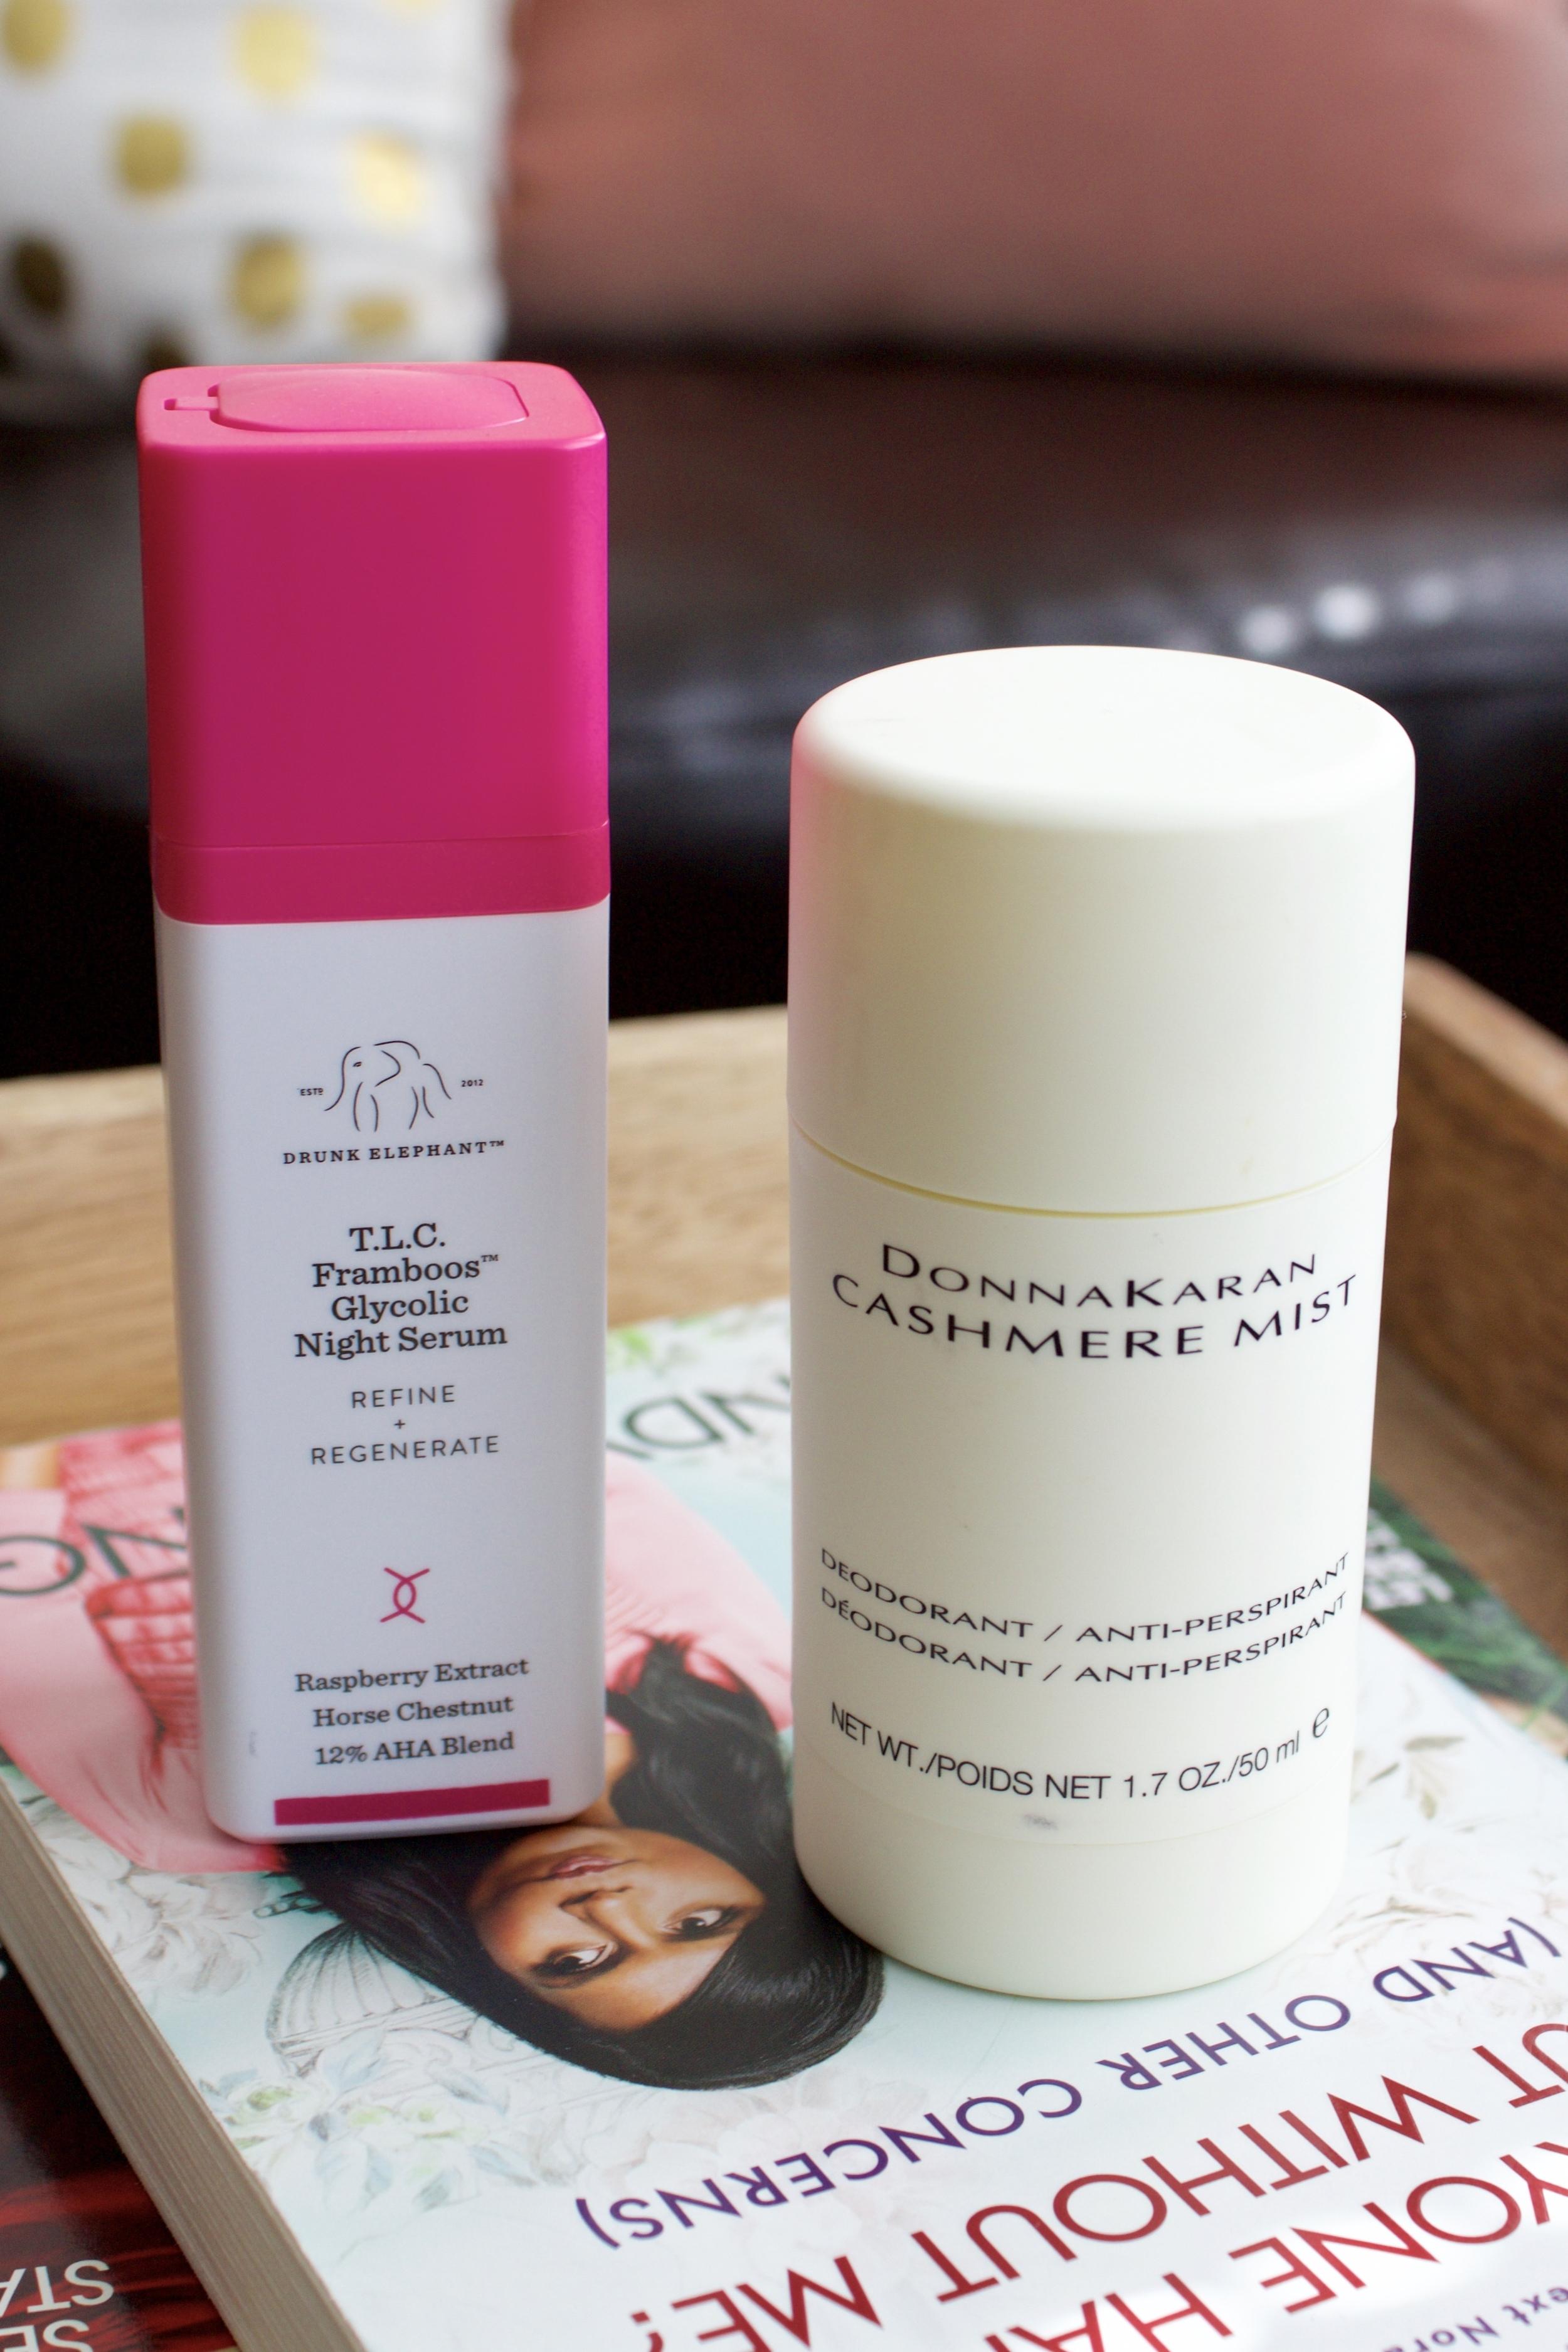 Samantha McNeil July Favorites - Night Serum and Deodorant